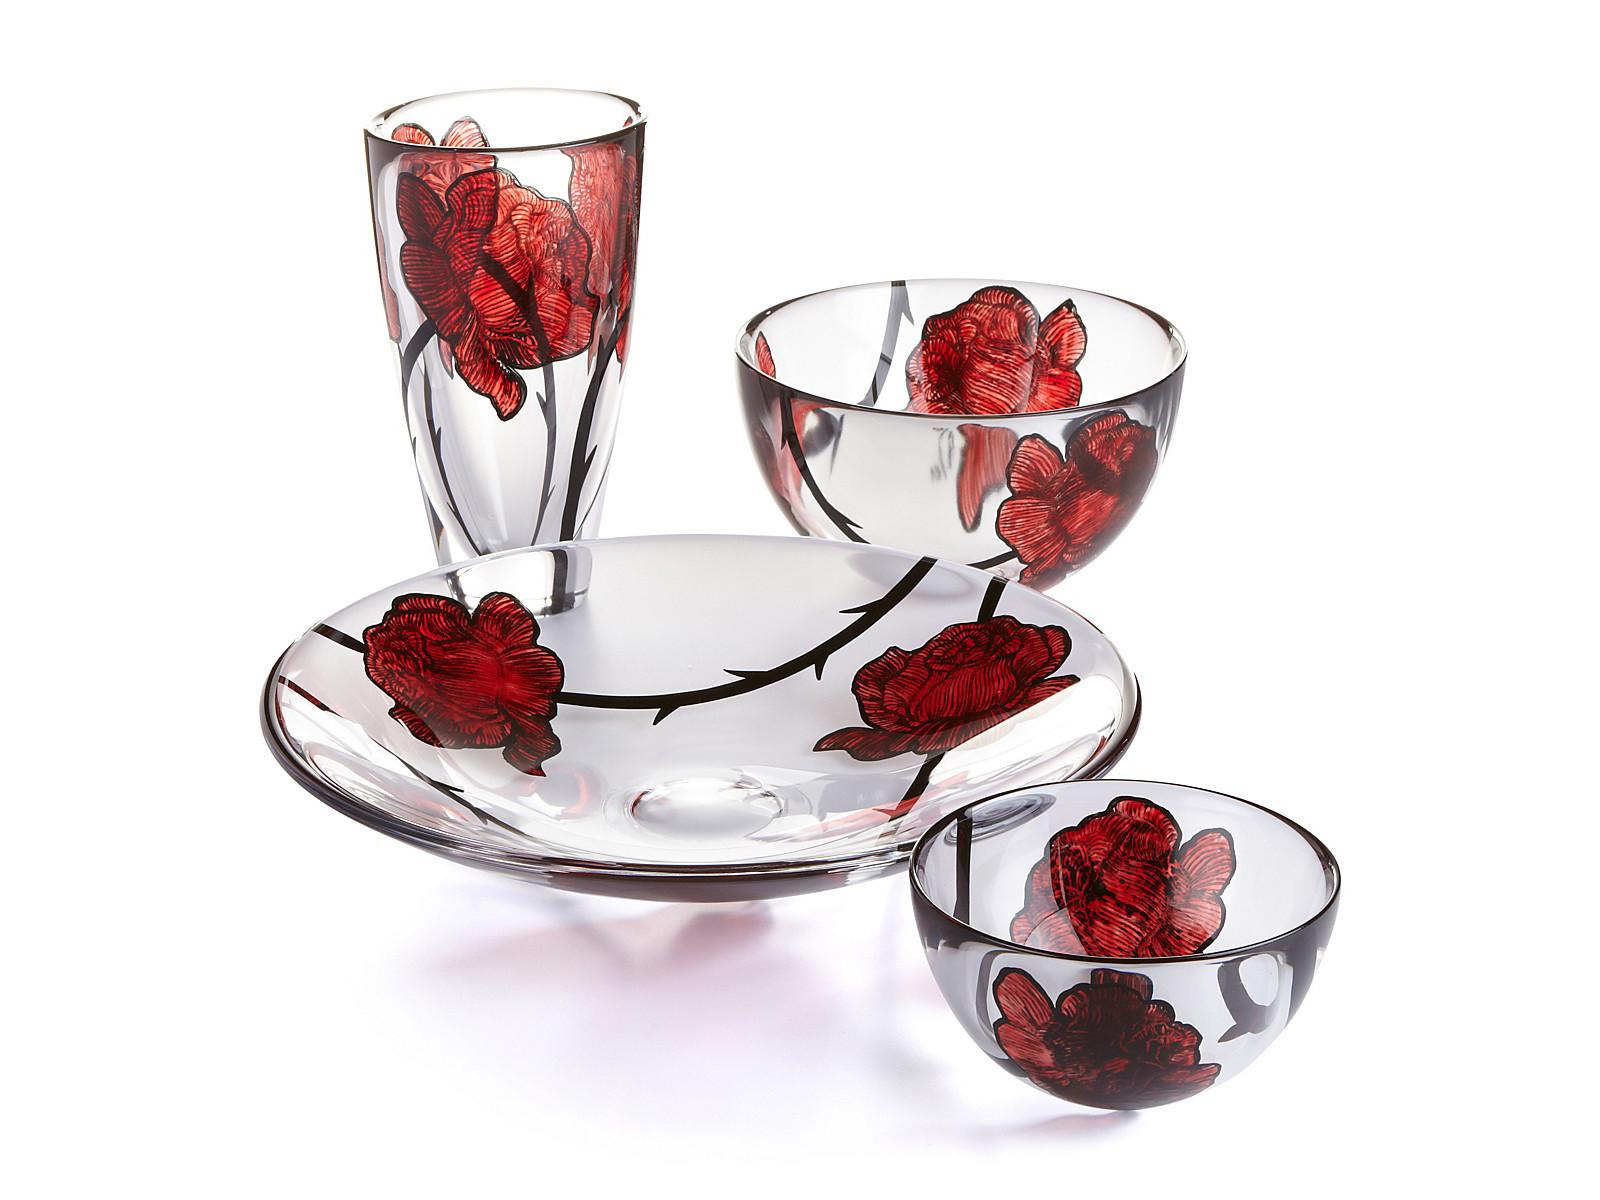 kosta boda vases australia of rose tattoo bowls kosta boda ahalife intended for rose tattoo bowls large3